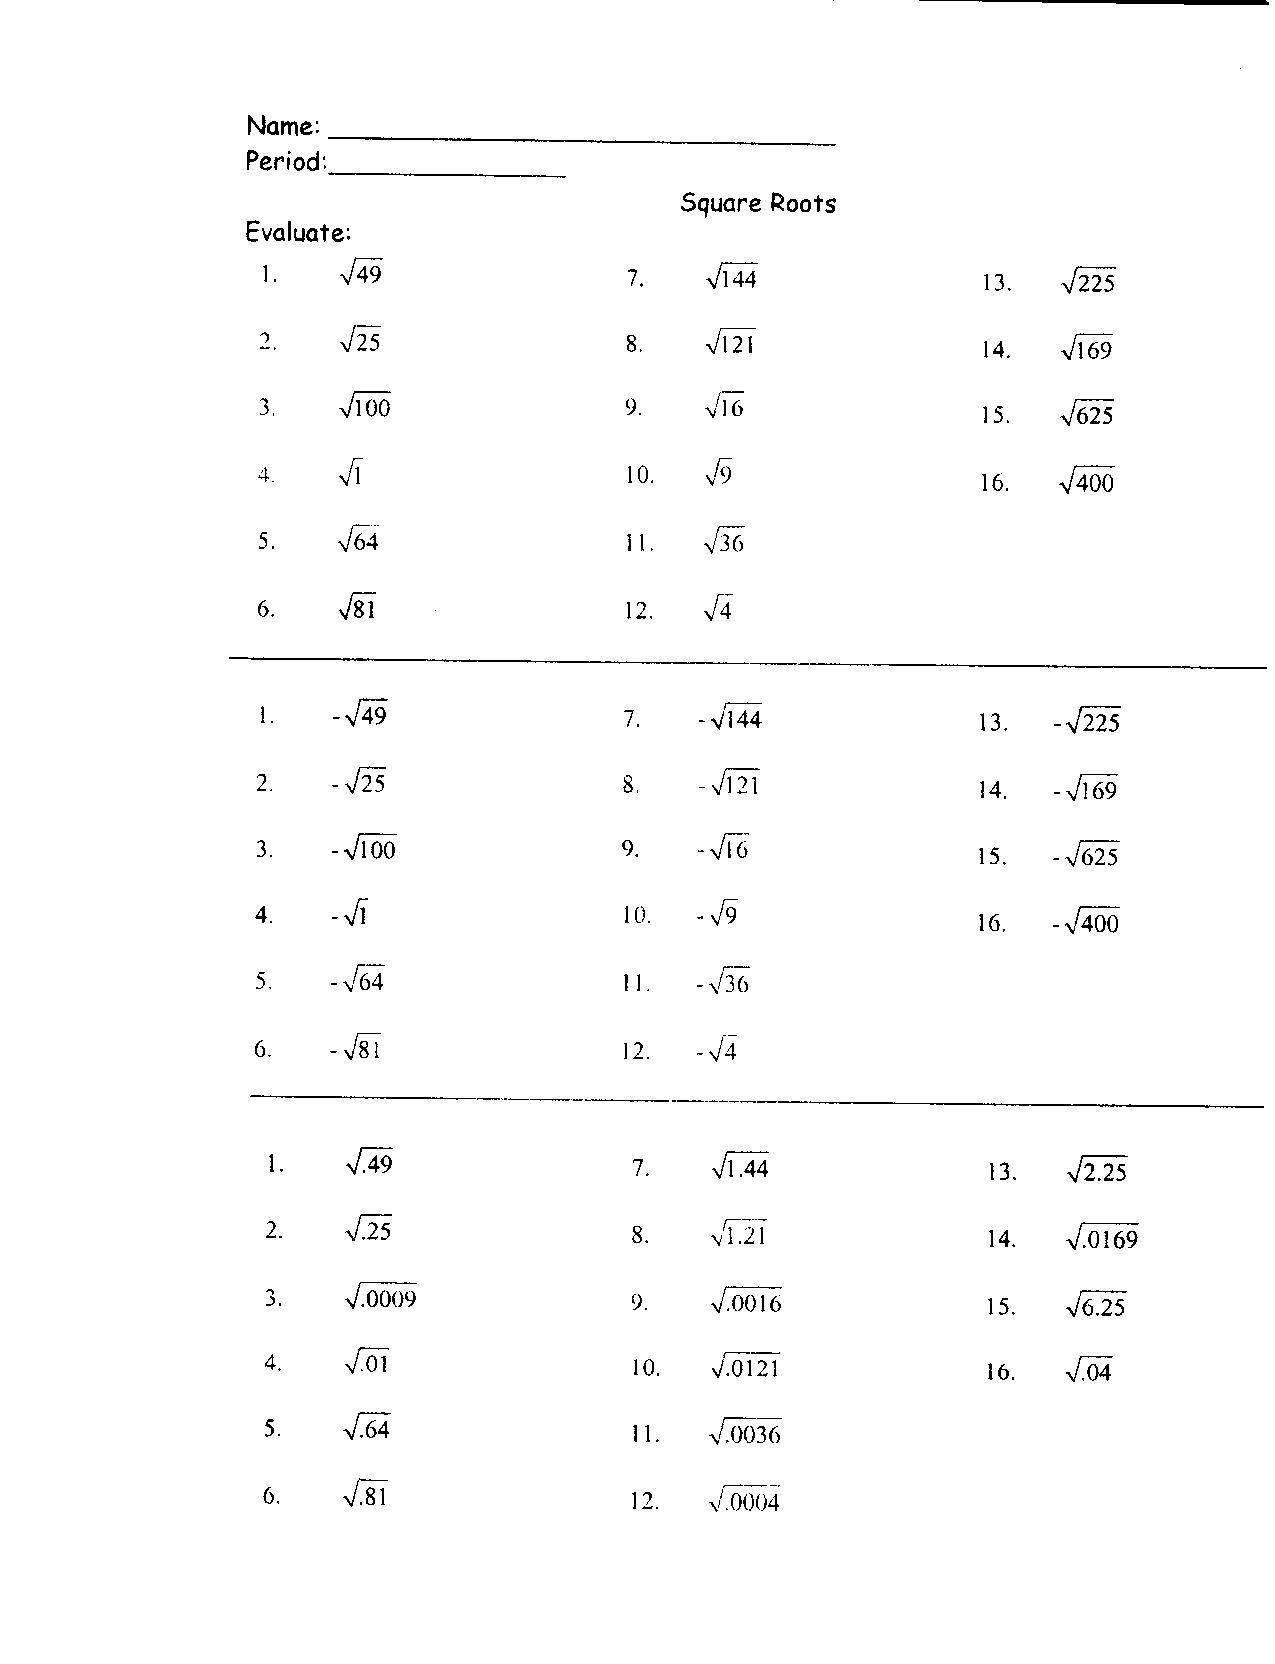 Square Root Practice Worksheet